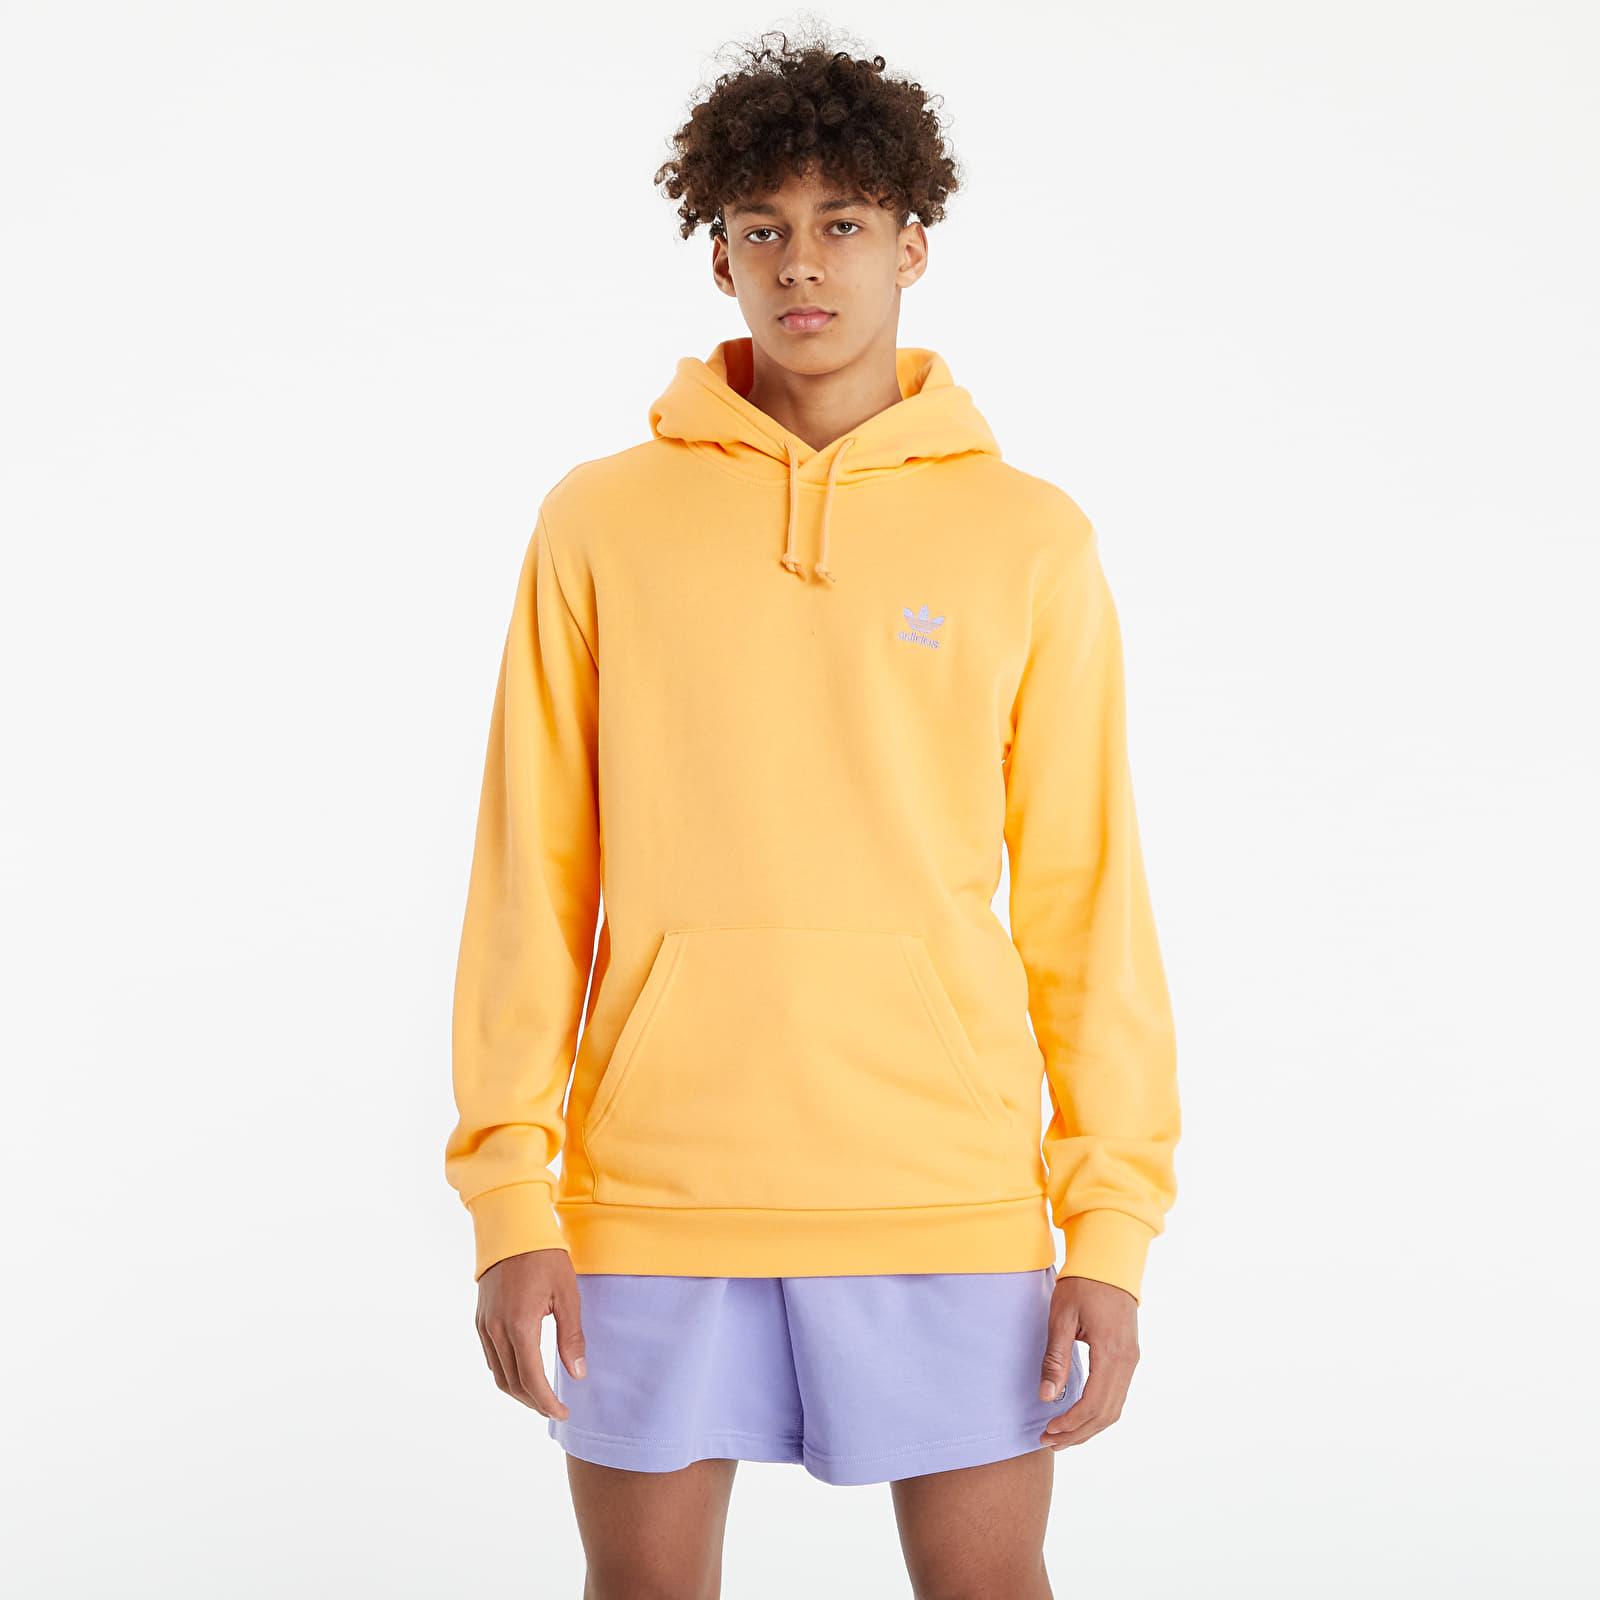 adidas Originals LOUNGEWEAR Trefoil Essentials Hoodie Hazy Orange EUR